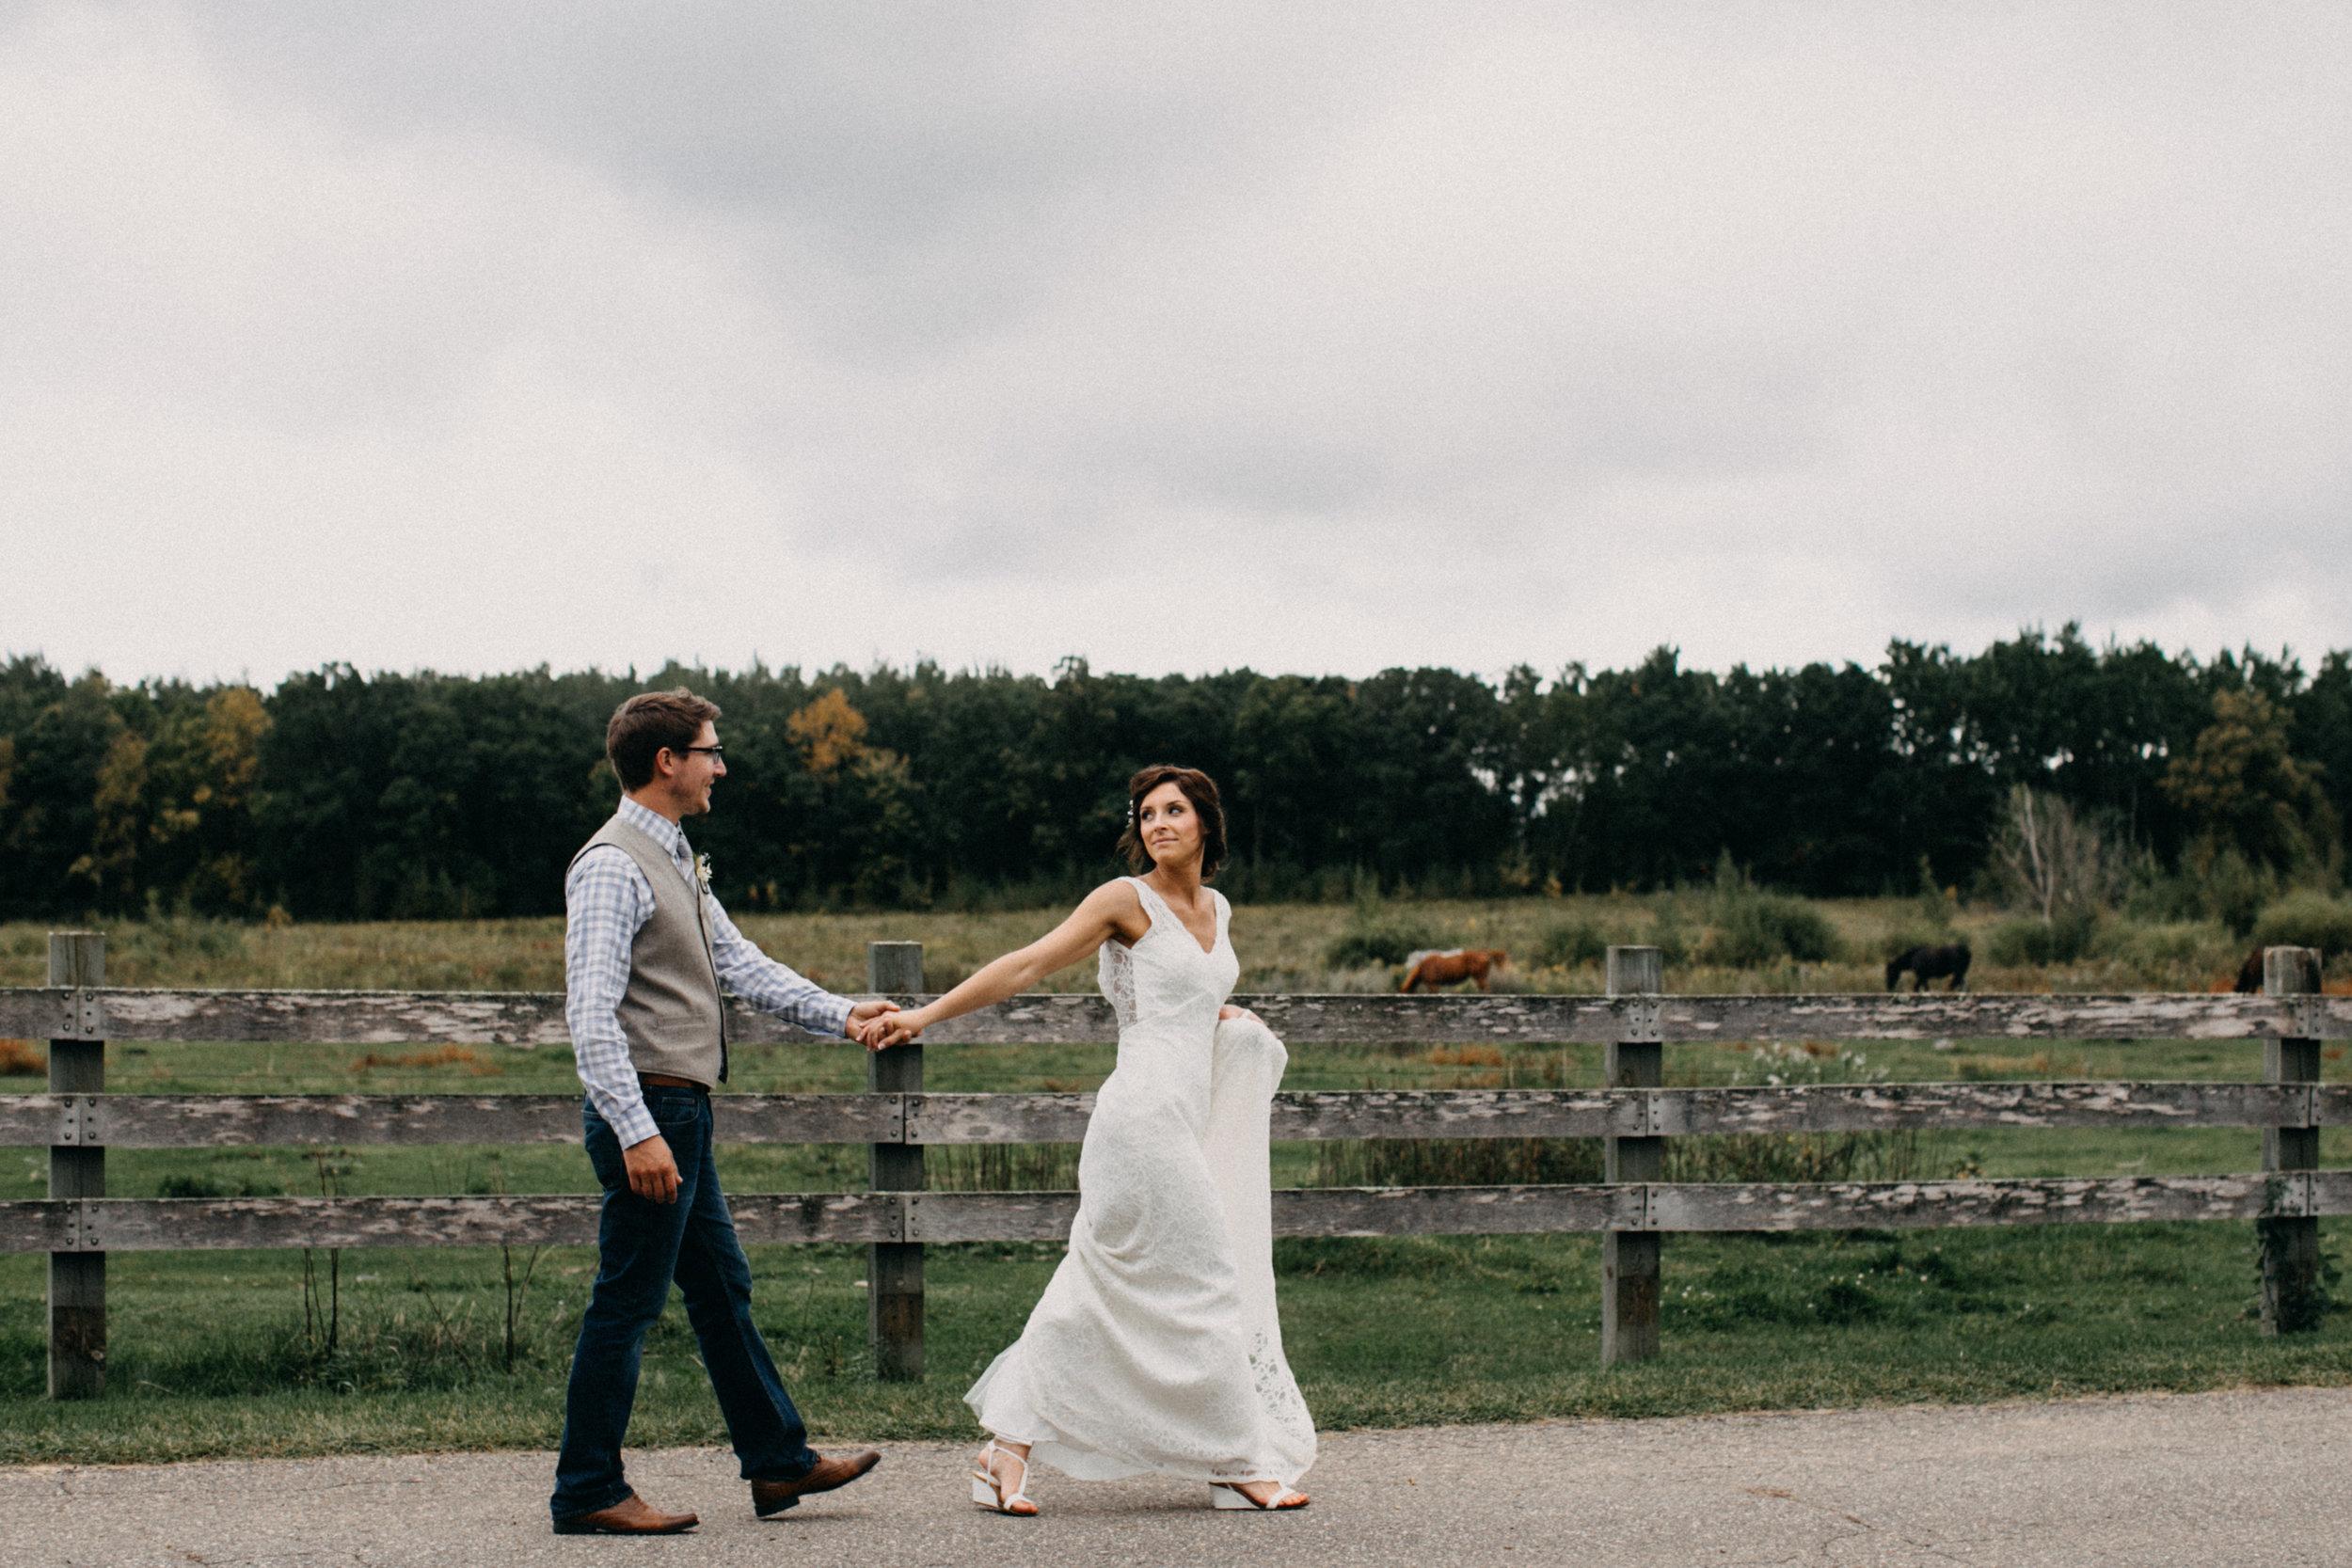 Rustic chic family farm wedding in Brainerd MN